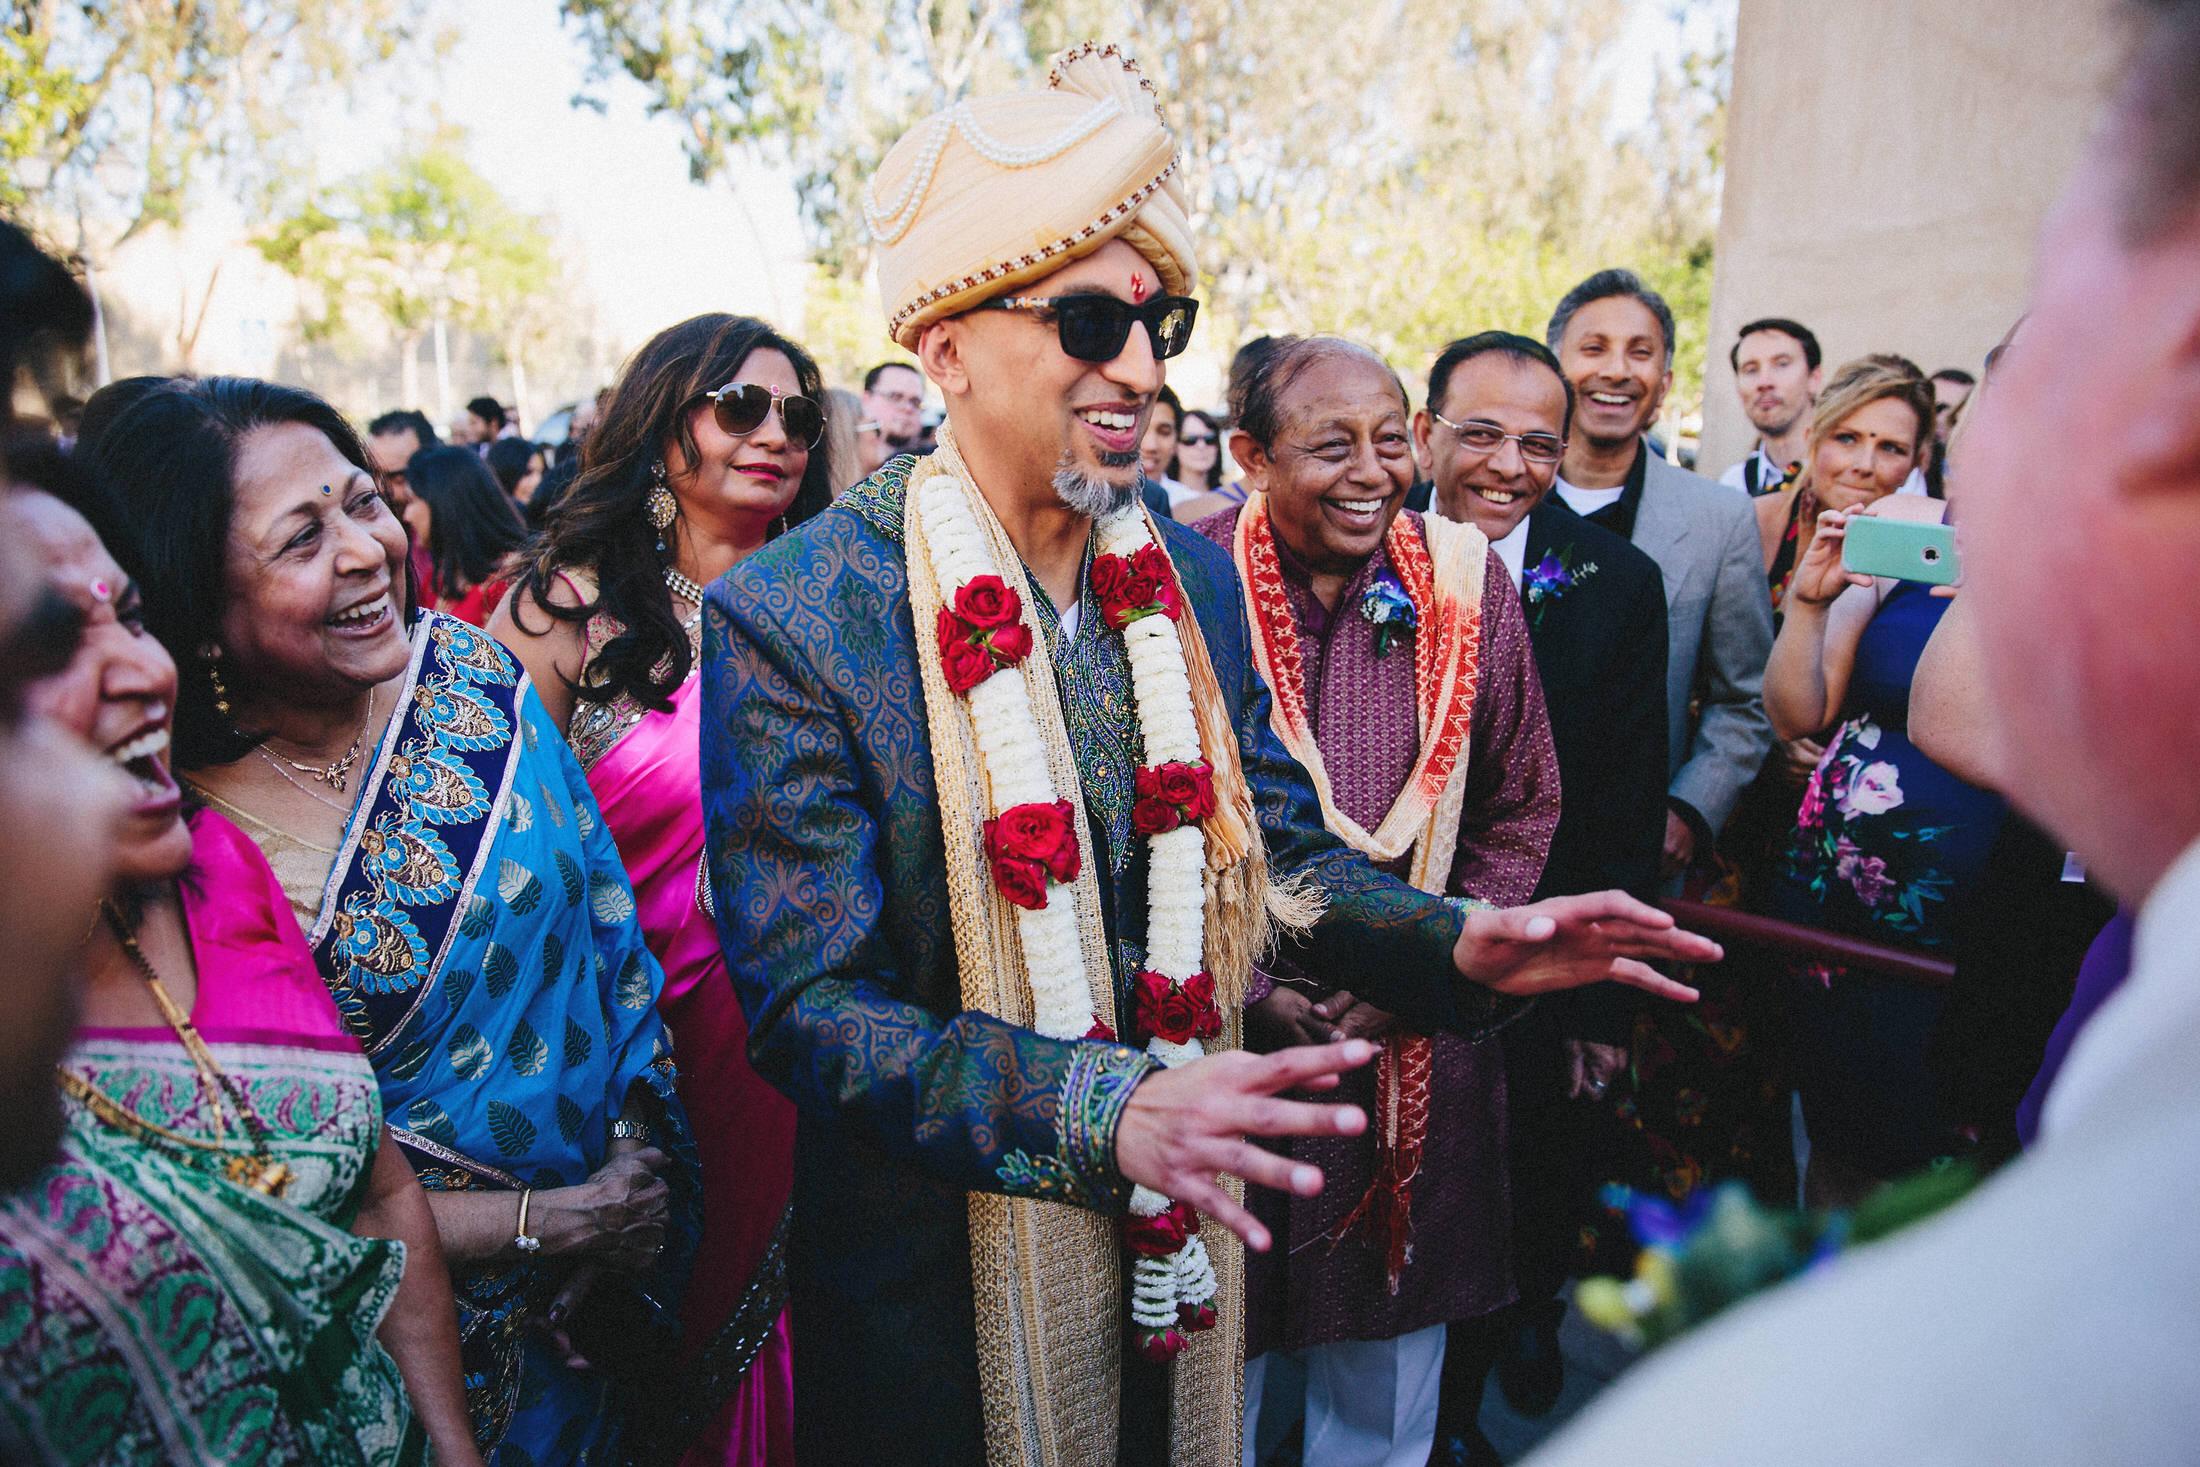 Modern-Indian-Serra-Plaza-wedding-044.jpg